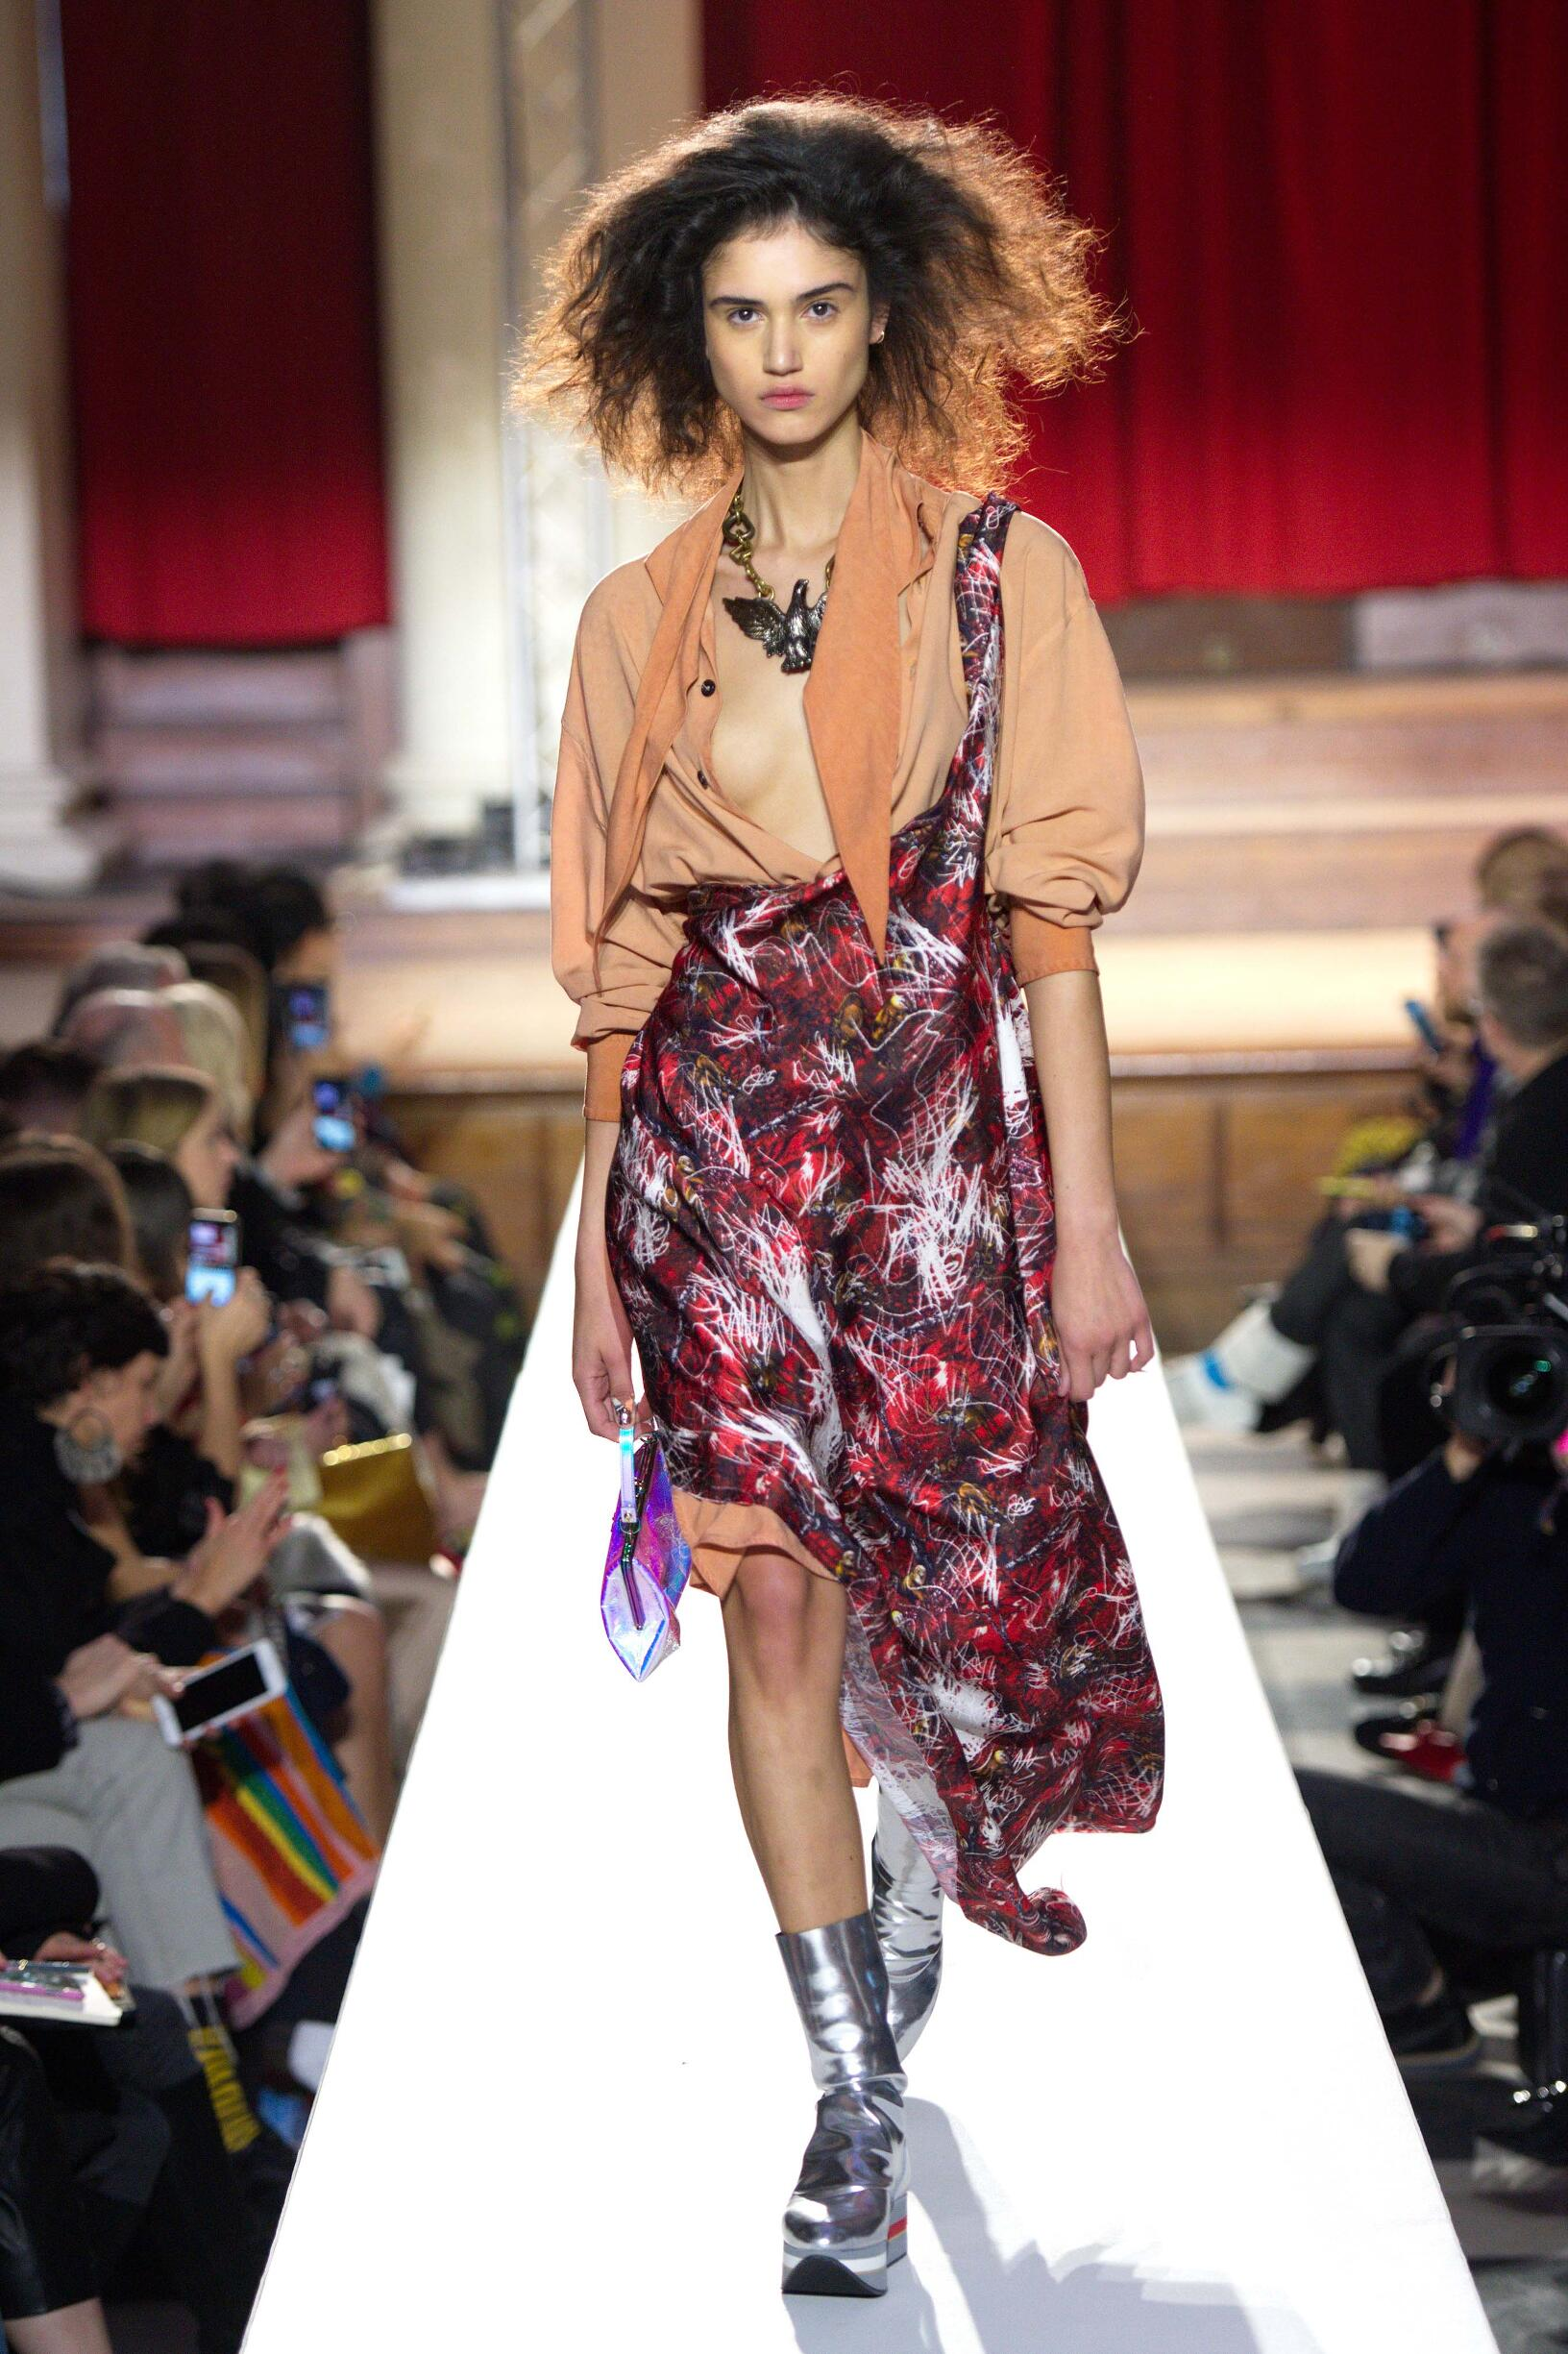 Vivienne Westwood Womenswear Collection Trends Winter